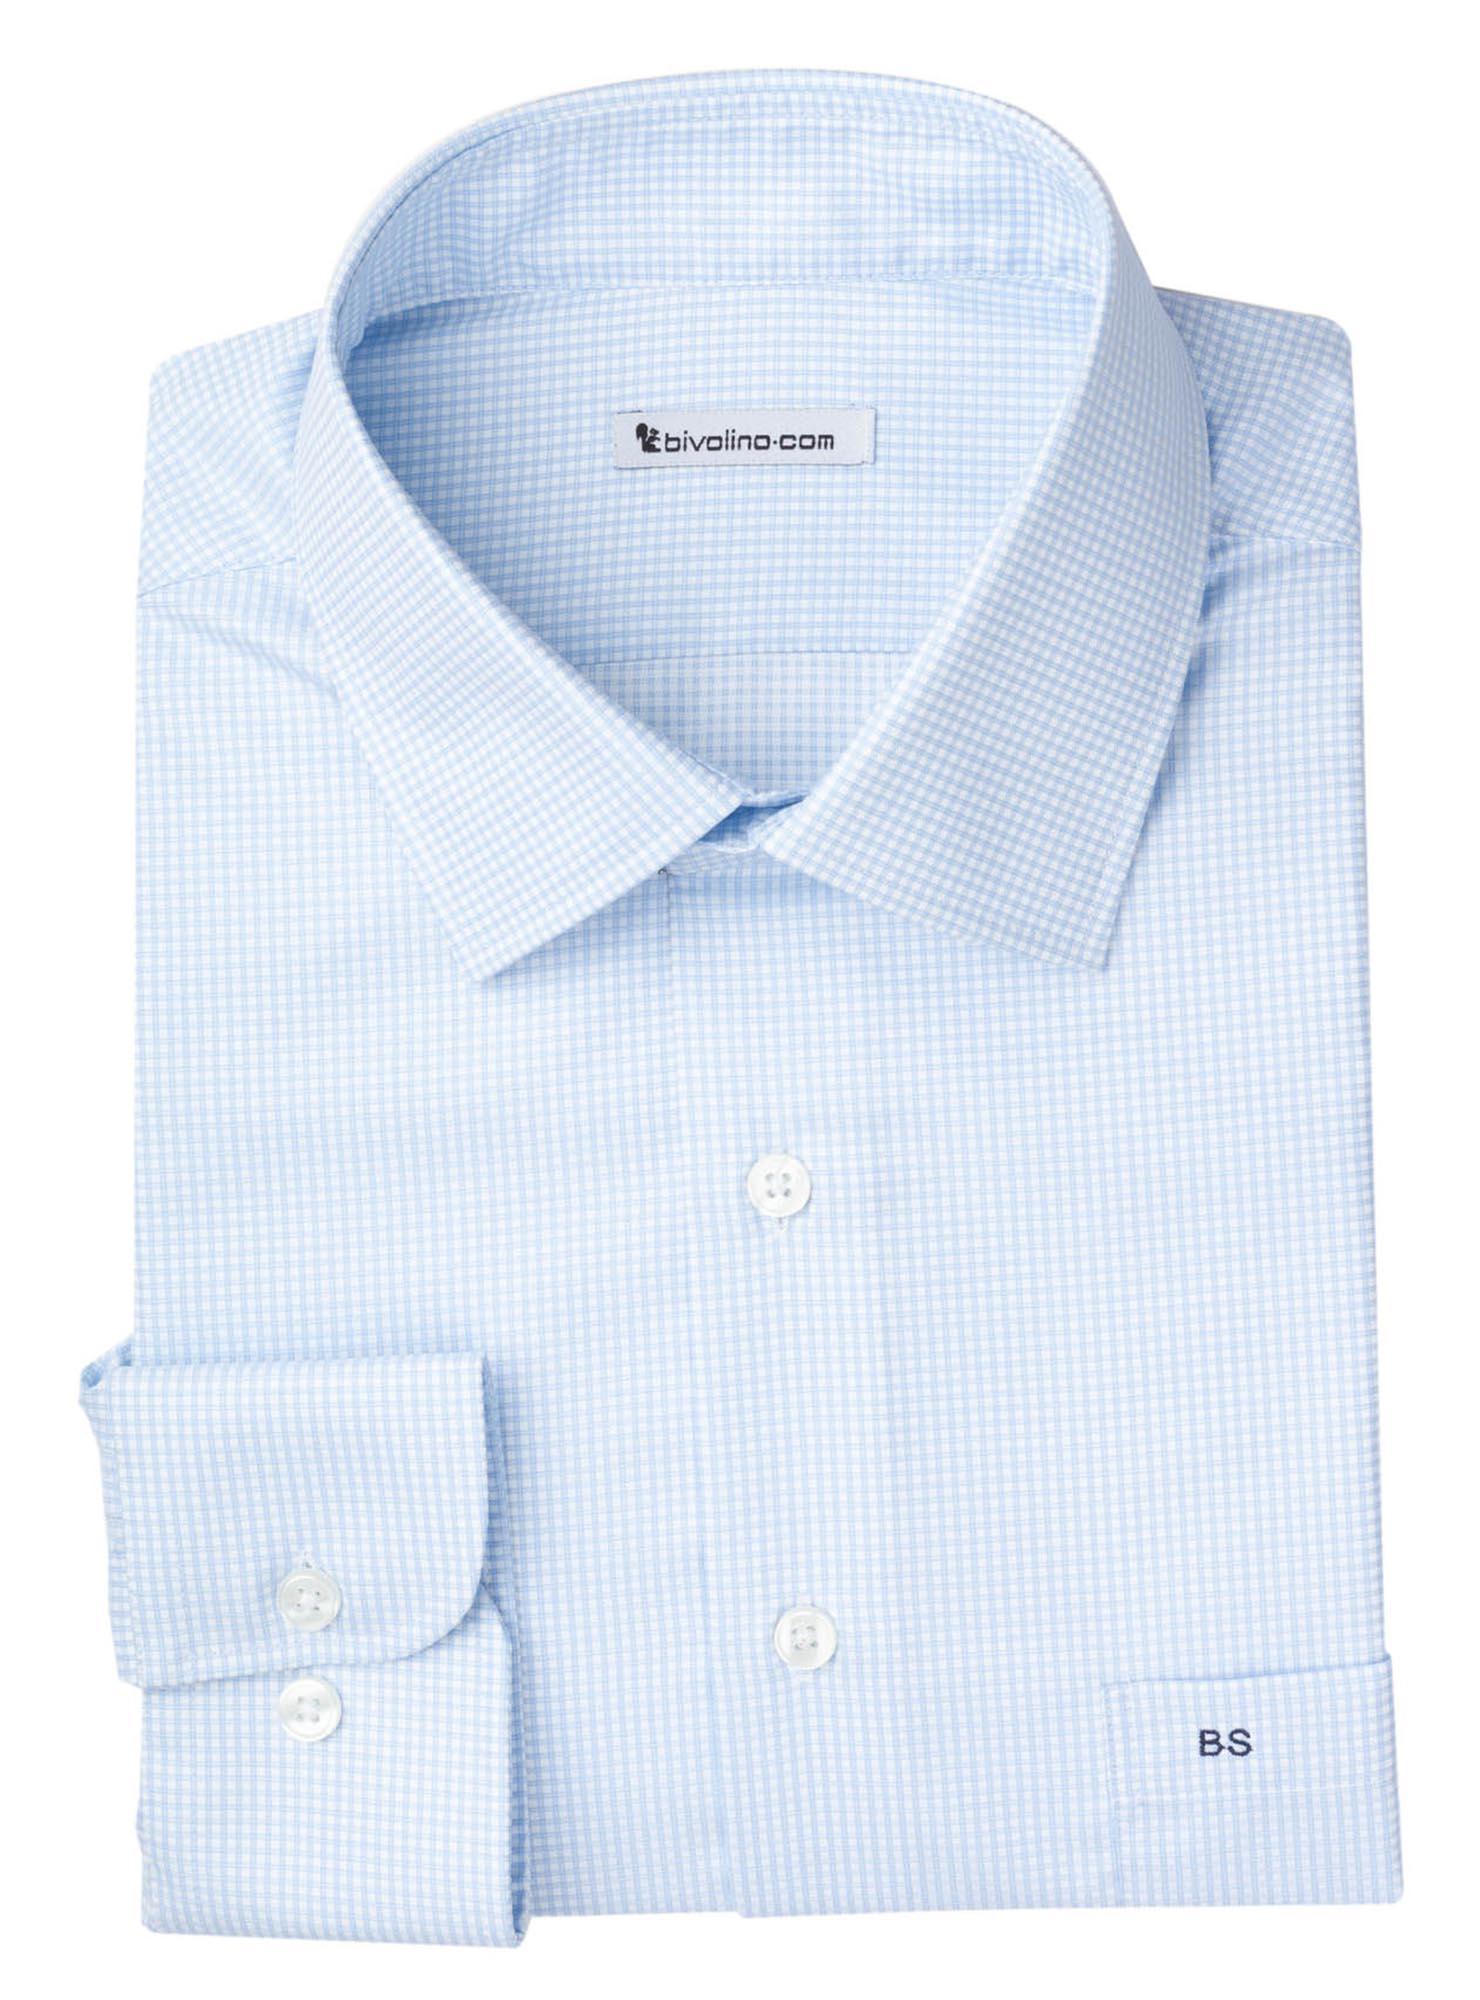 PALLONI - Männerhemd Supima Vollzwirn Baumwolle blaues Karo - DARCi 1